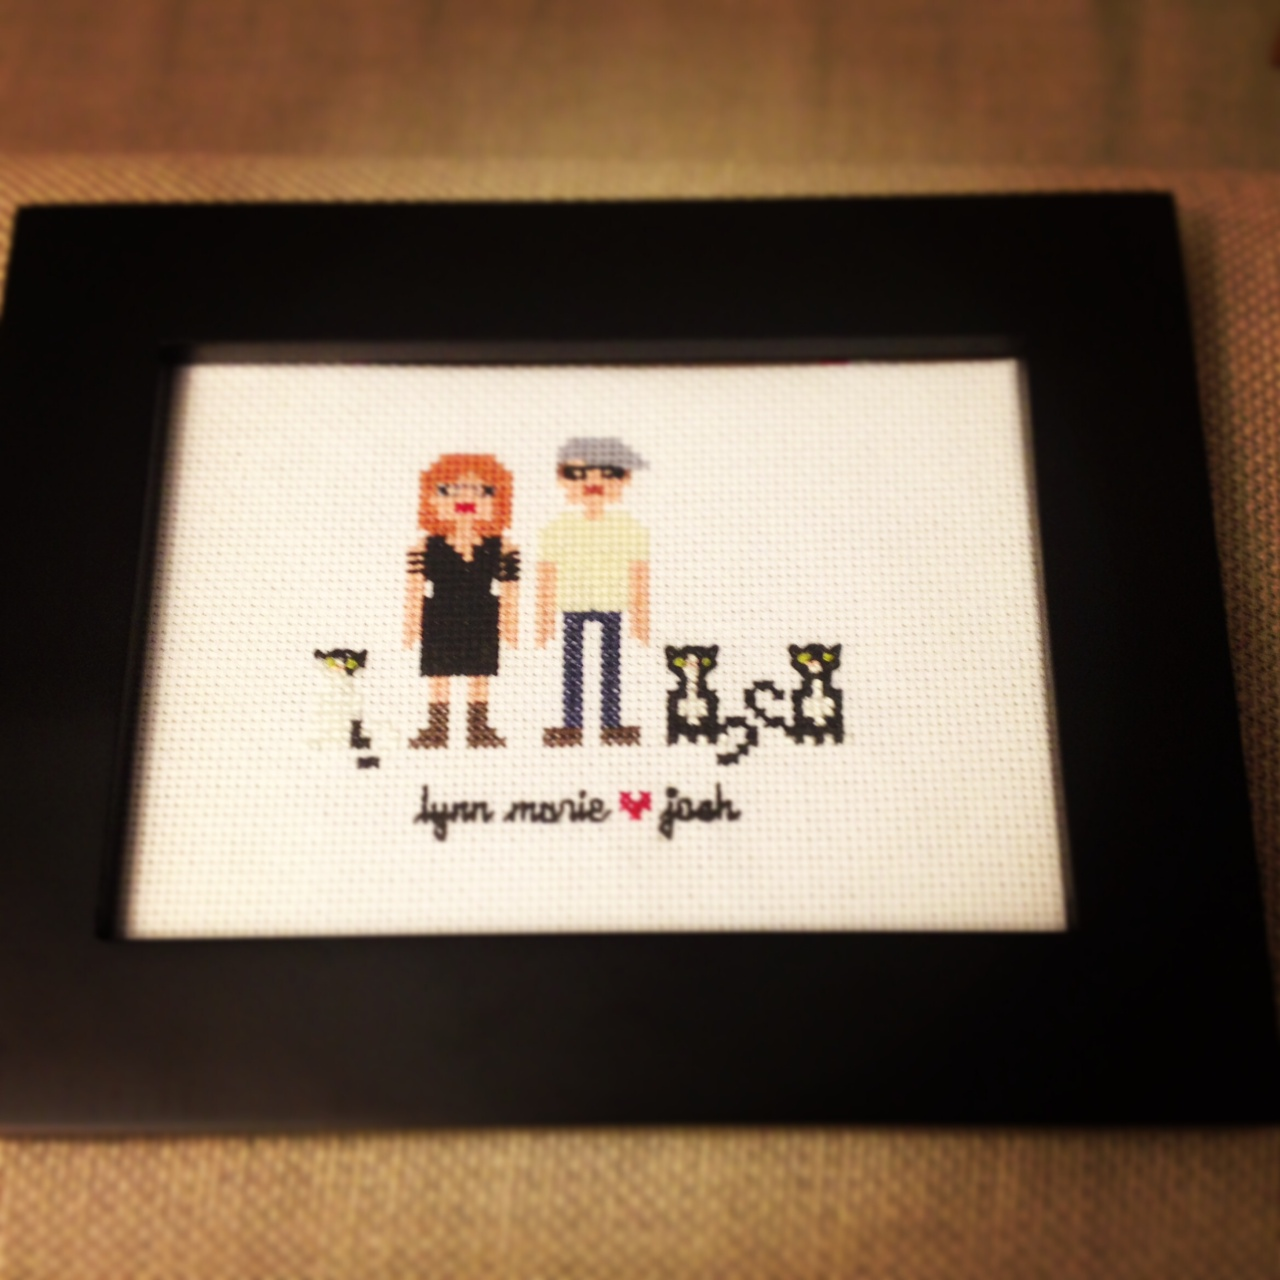 Lynn Marie and Josh as pixel people, cross-stitch